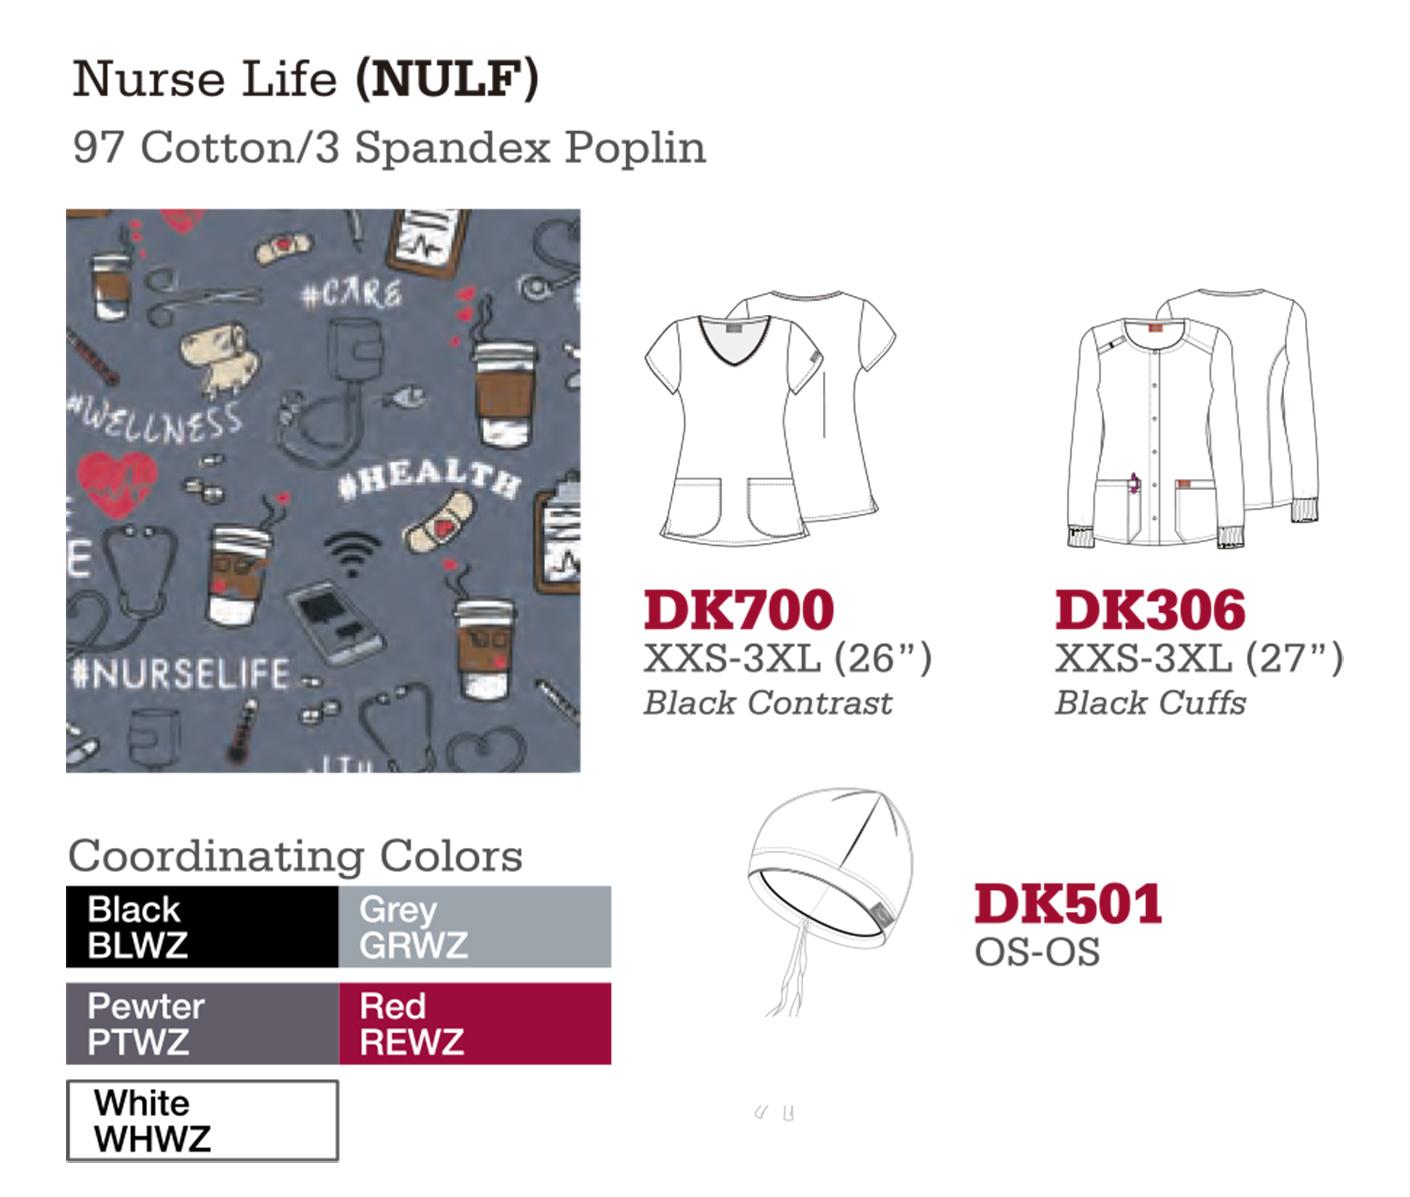 Nurse Life. DK700. DK306. DK501.